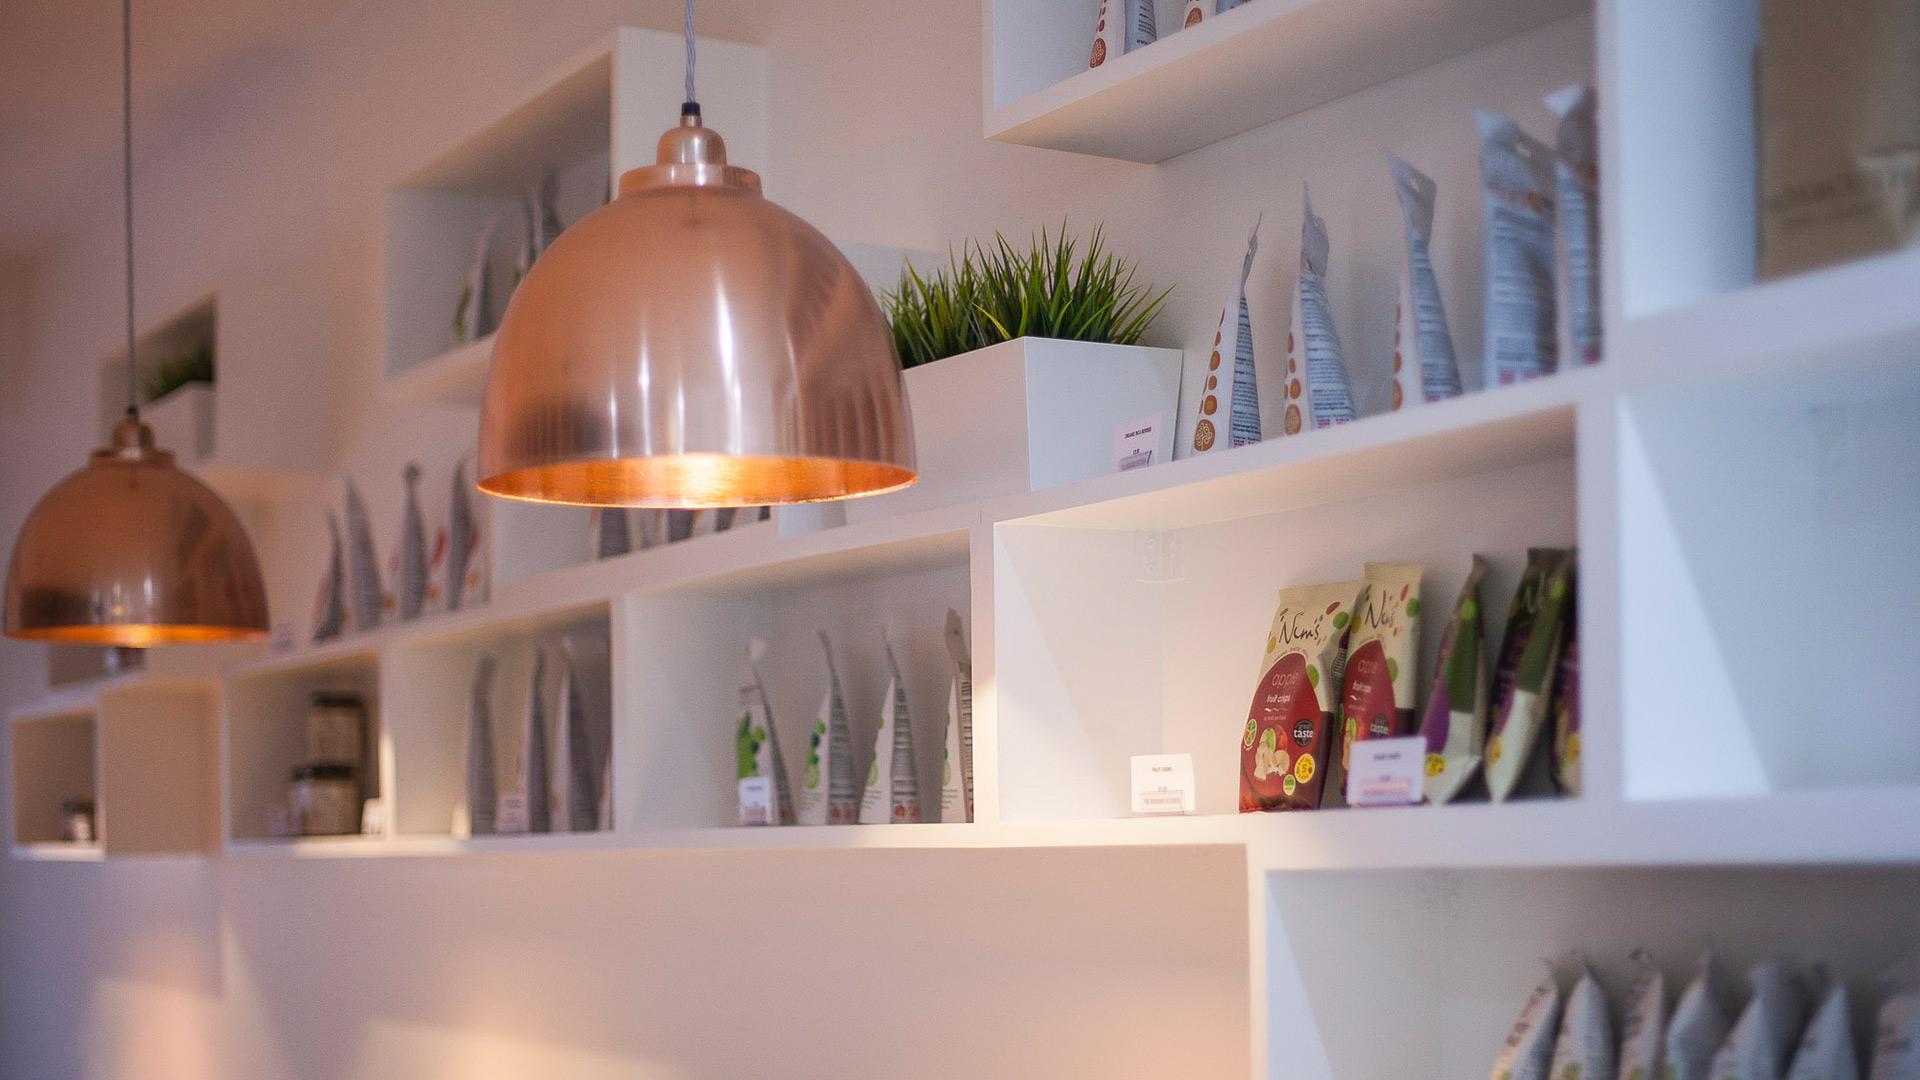 organic kitchen design. The Liqui design team have exceeded all my expectations  Hilary Penning Managing Director Organic Kitchen Restaurant Interior Design